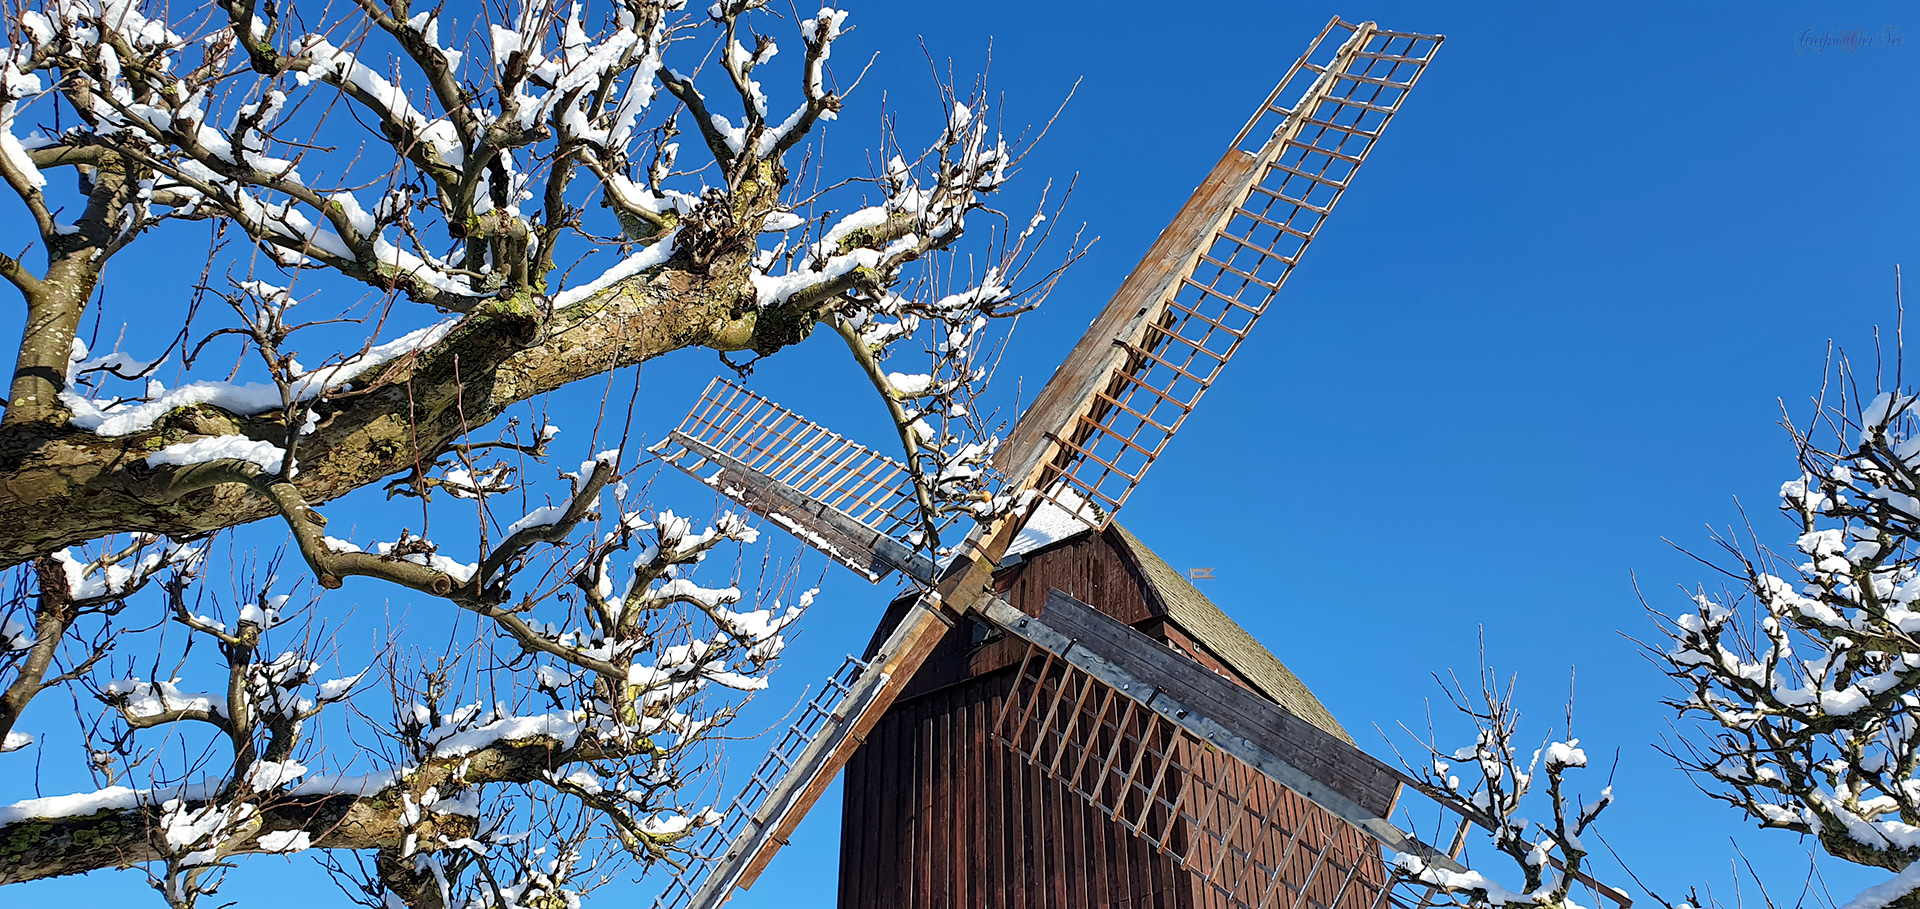 Bockwindmühle Greifswald-Eldena